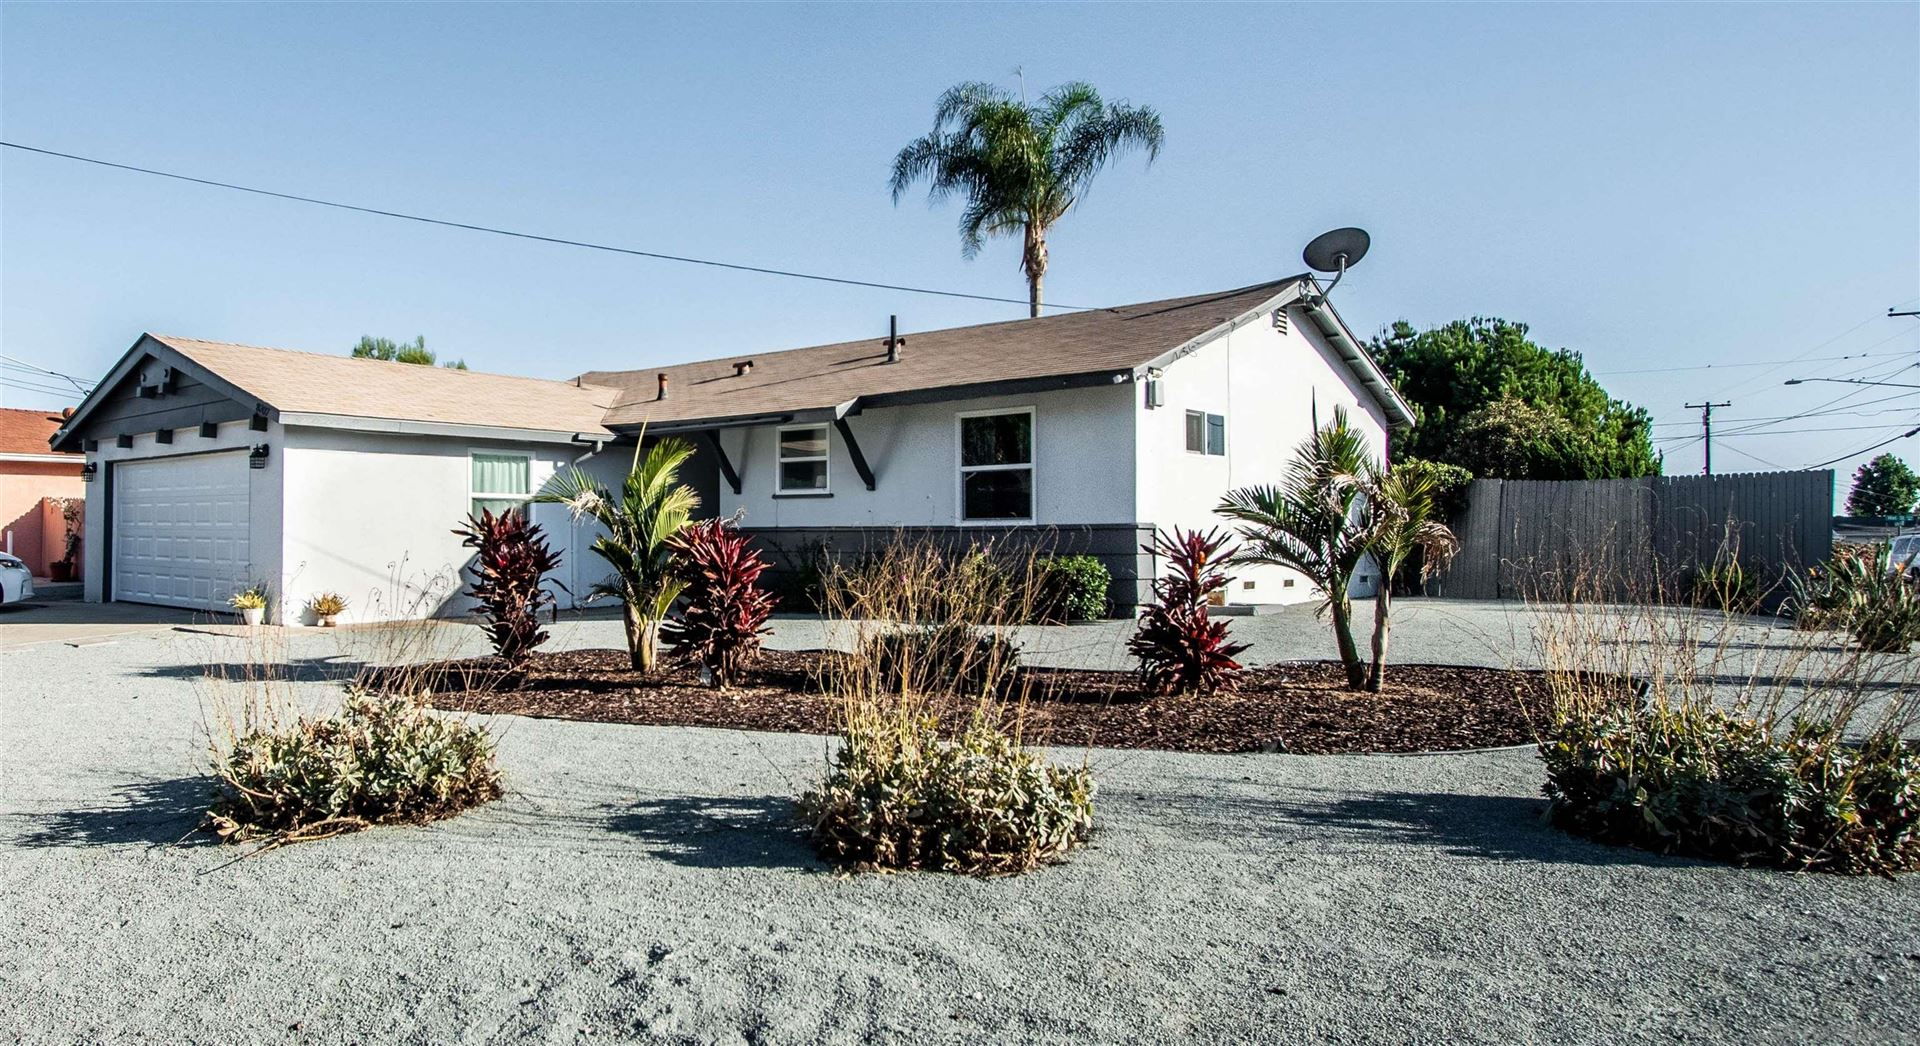 Photo of 8707 Saint George St, Spring Valley, CA 91977 (MLS # 210029443)